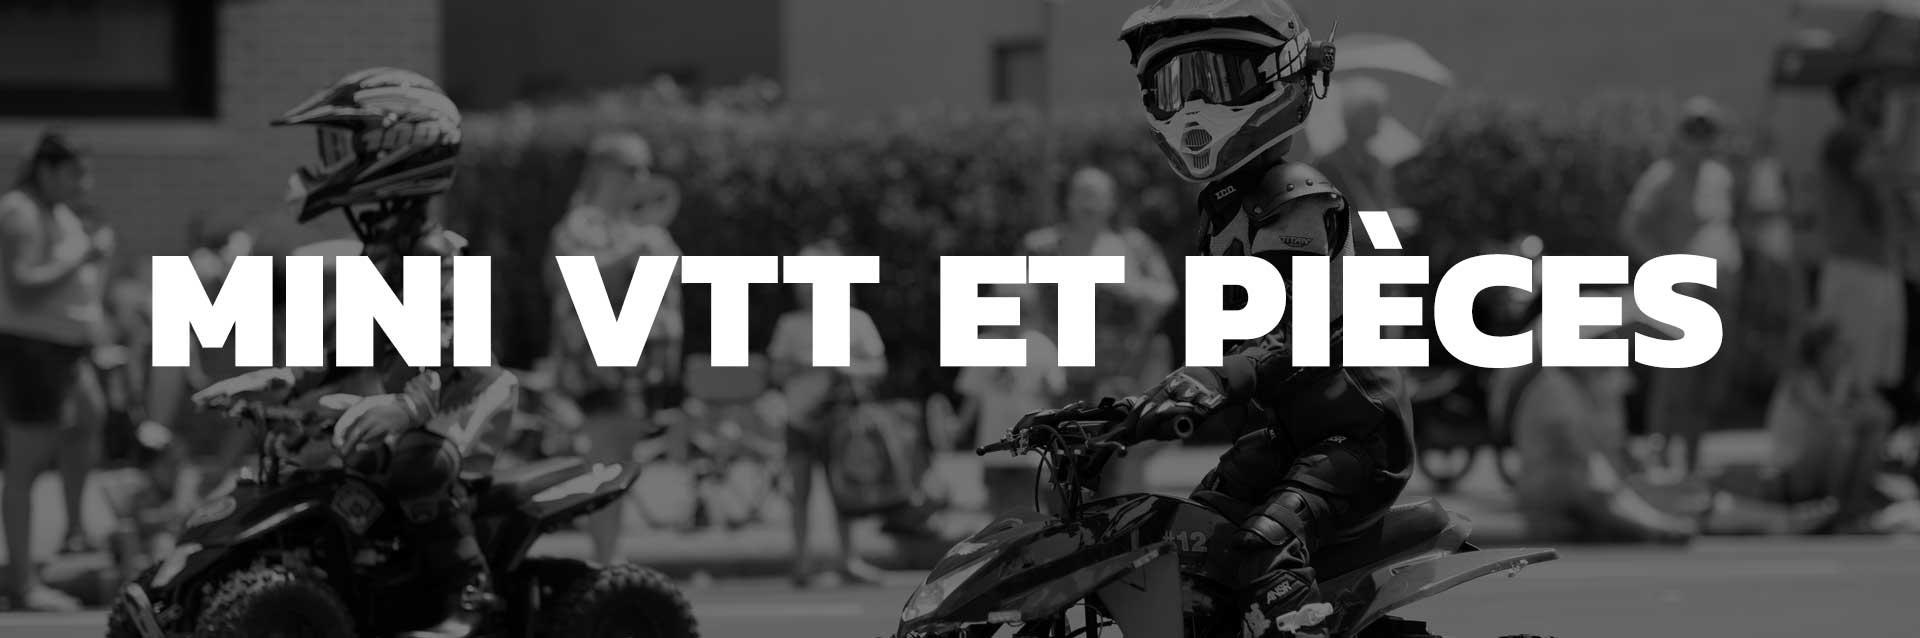 Mini VTT et pièces